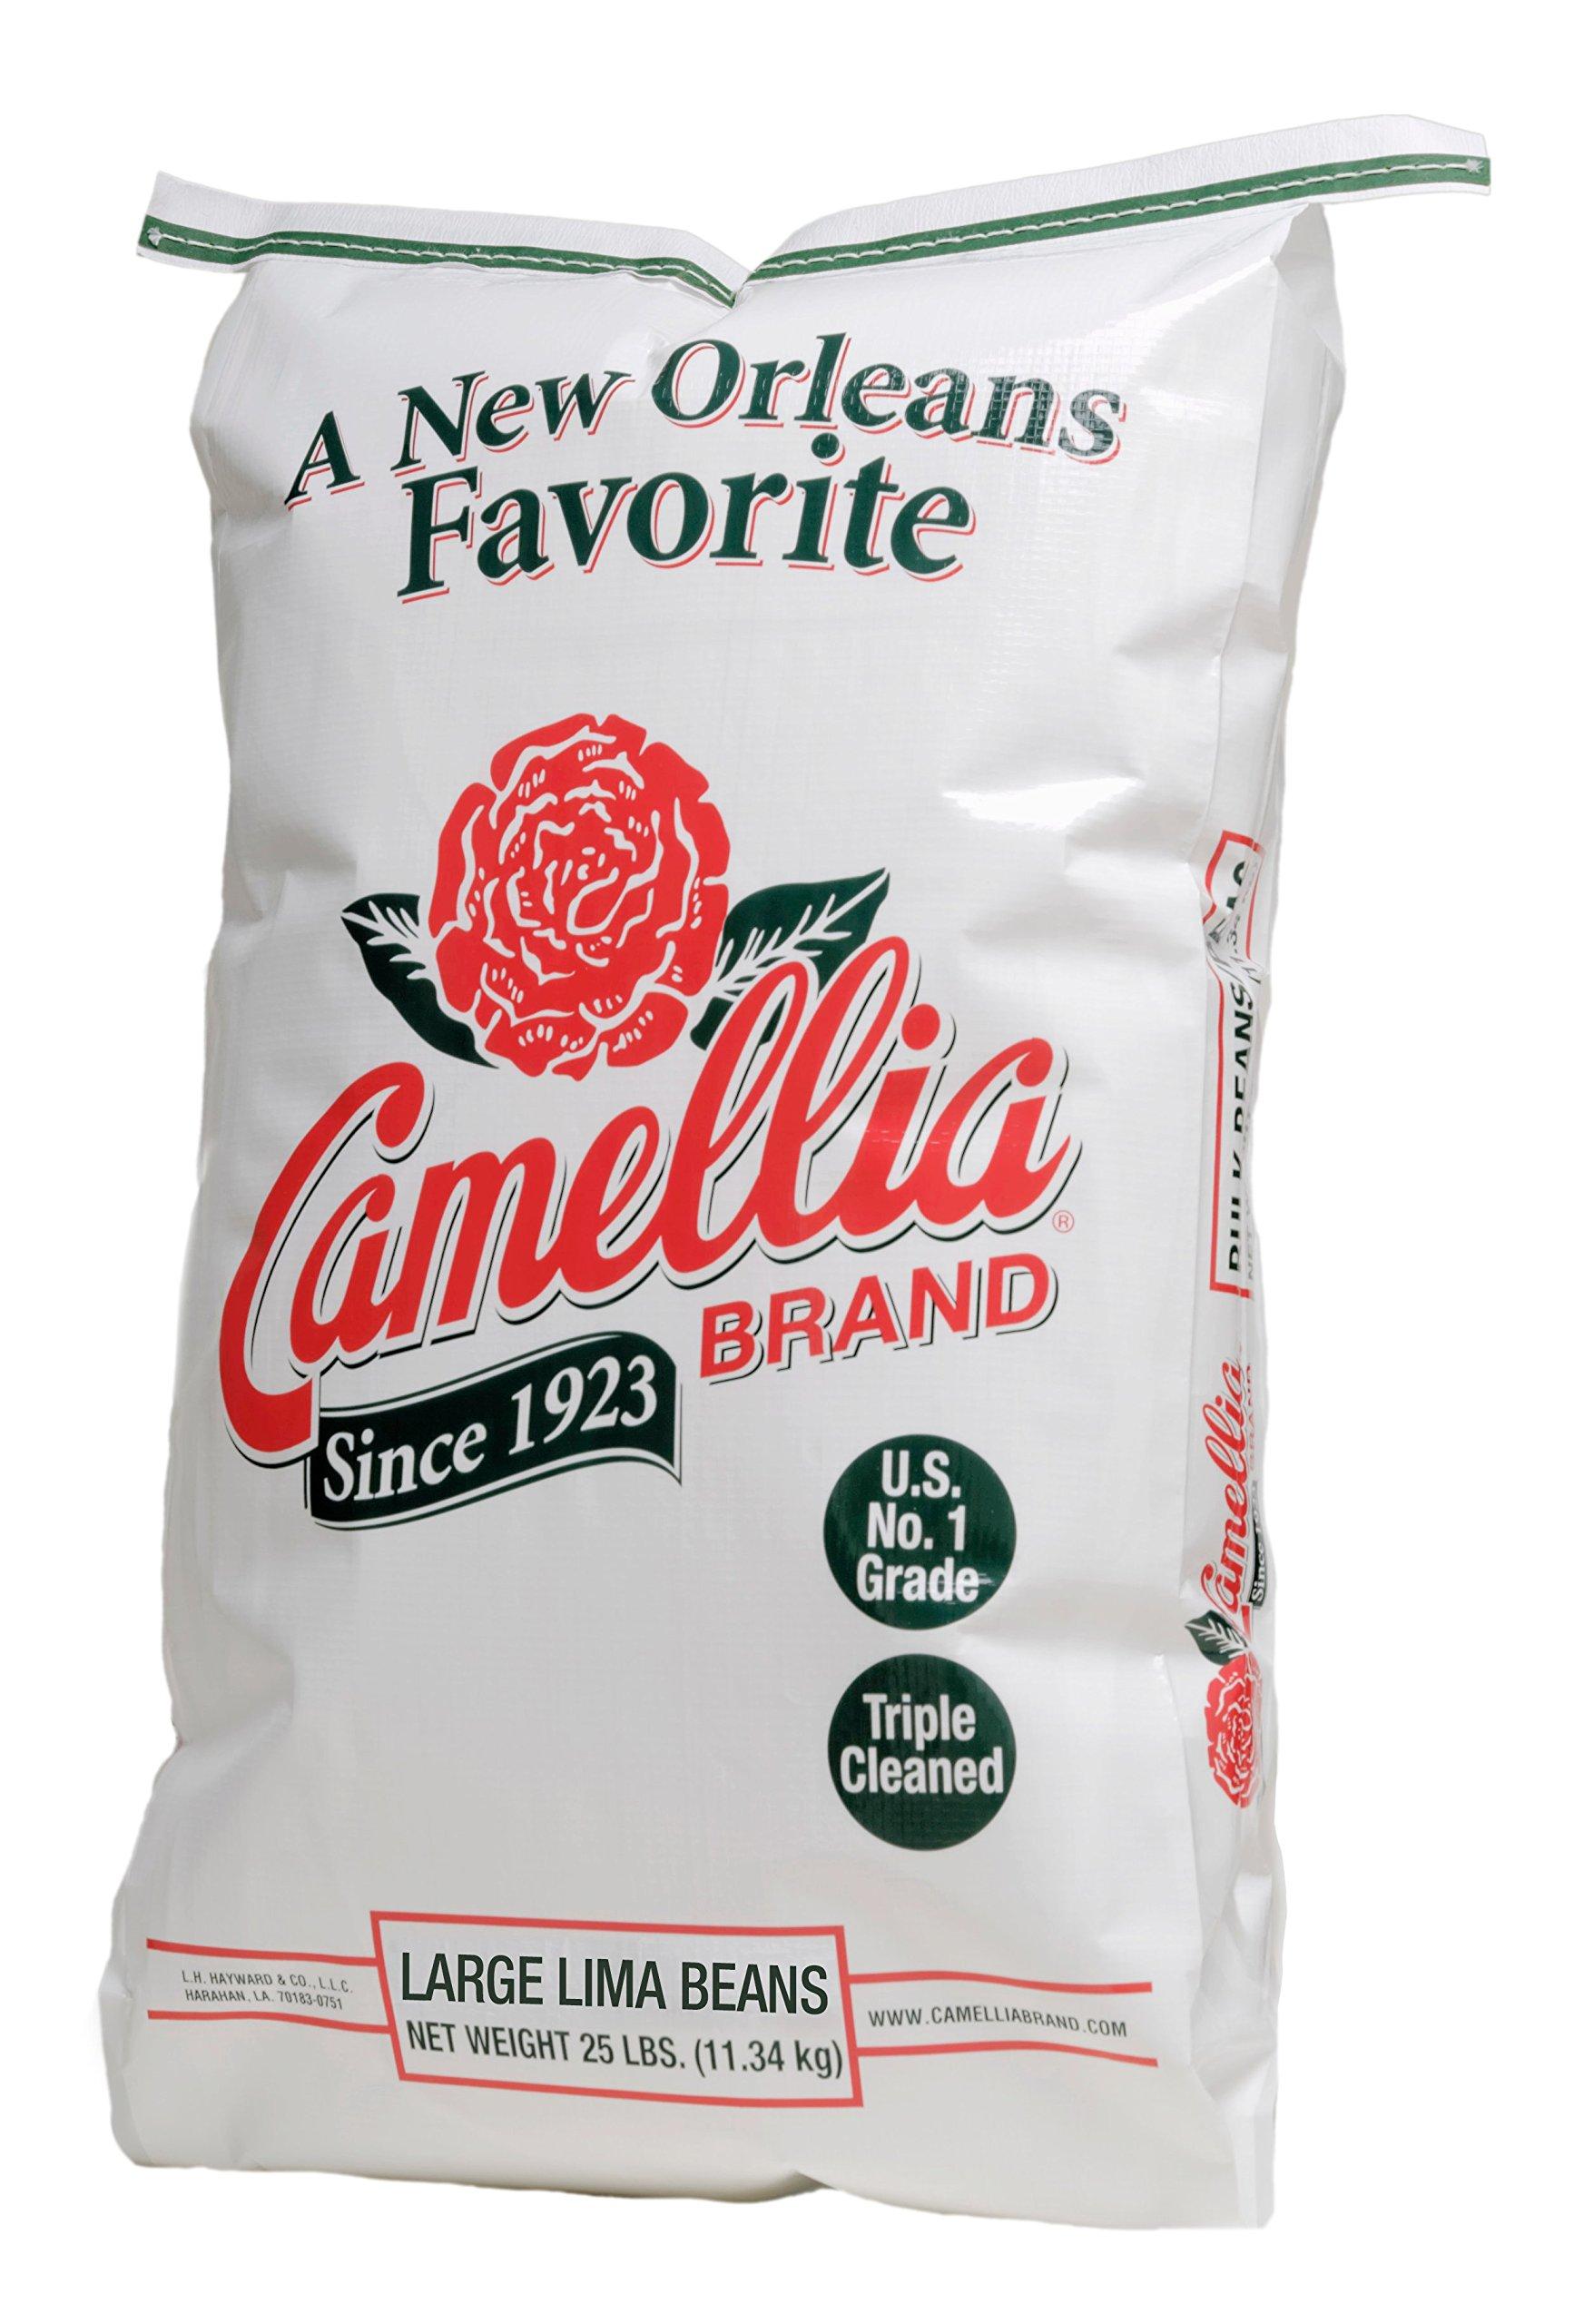 Camellia Brand - Large Lima Beans, Dry Beans (25 Pound Bag)